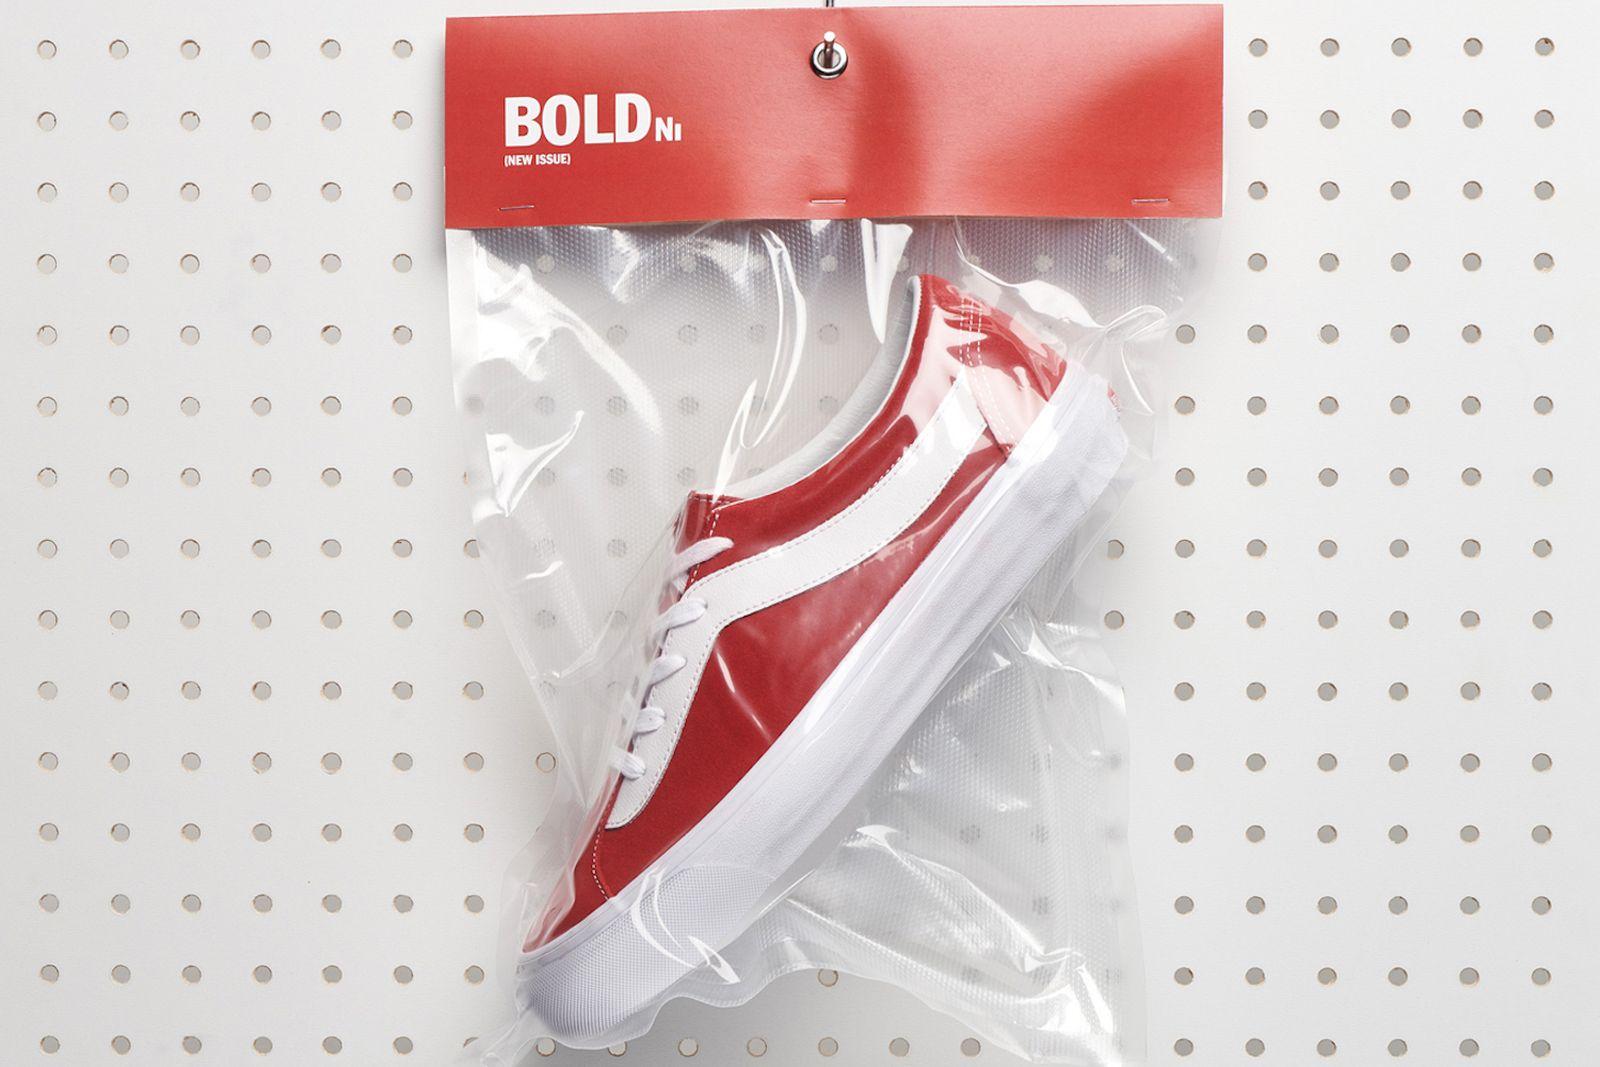 vans bold ni release date price info